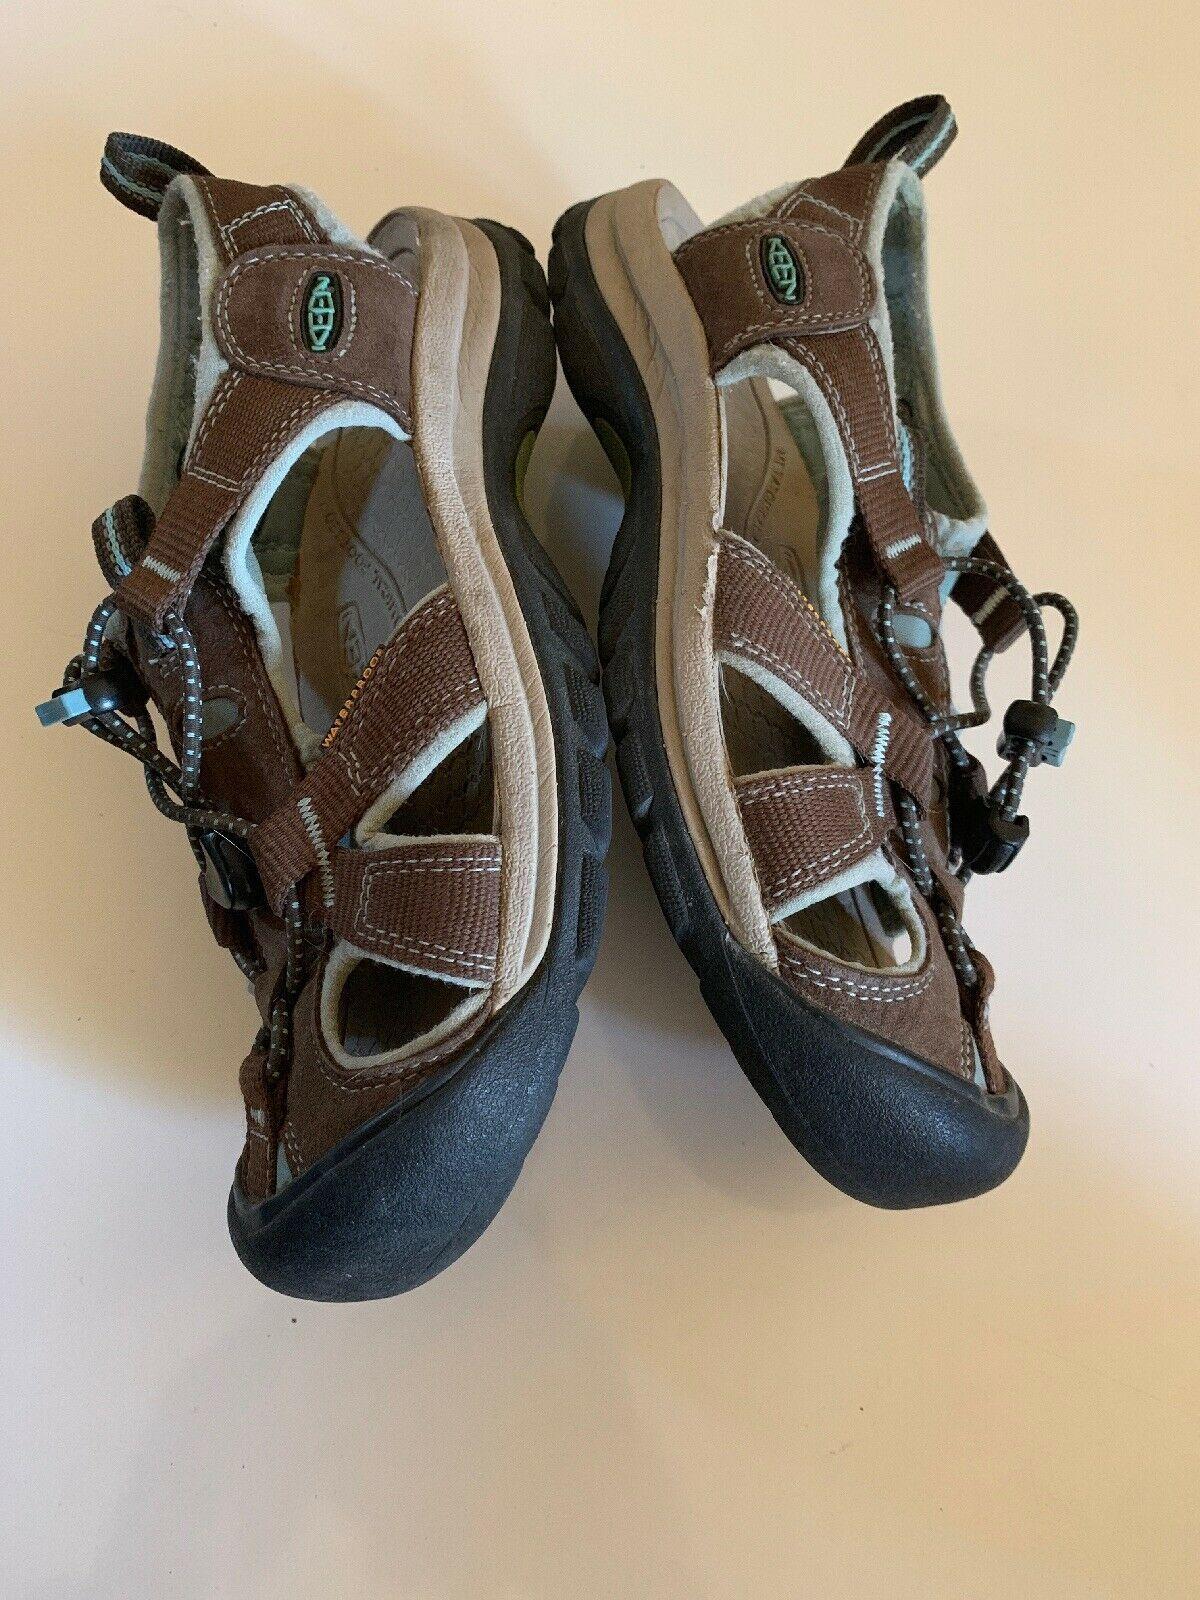 Women's Keen Sport Sandals Size 7 Water Shoes 1008020 Waterproof brown image 5